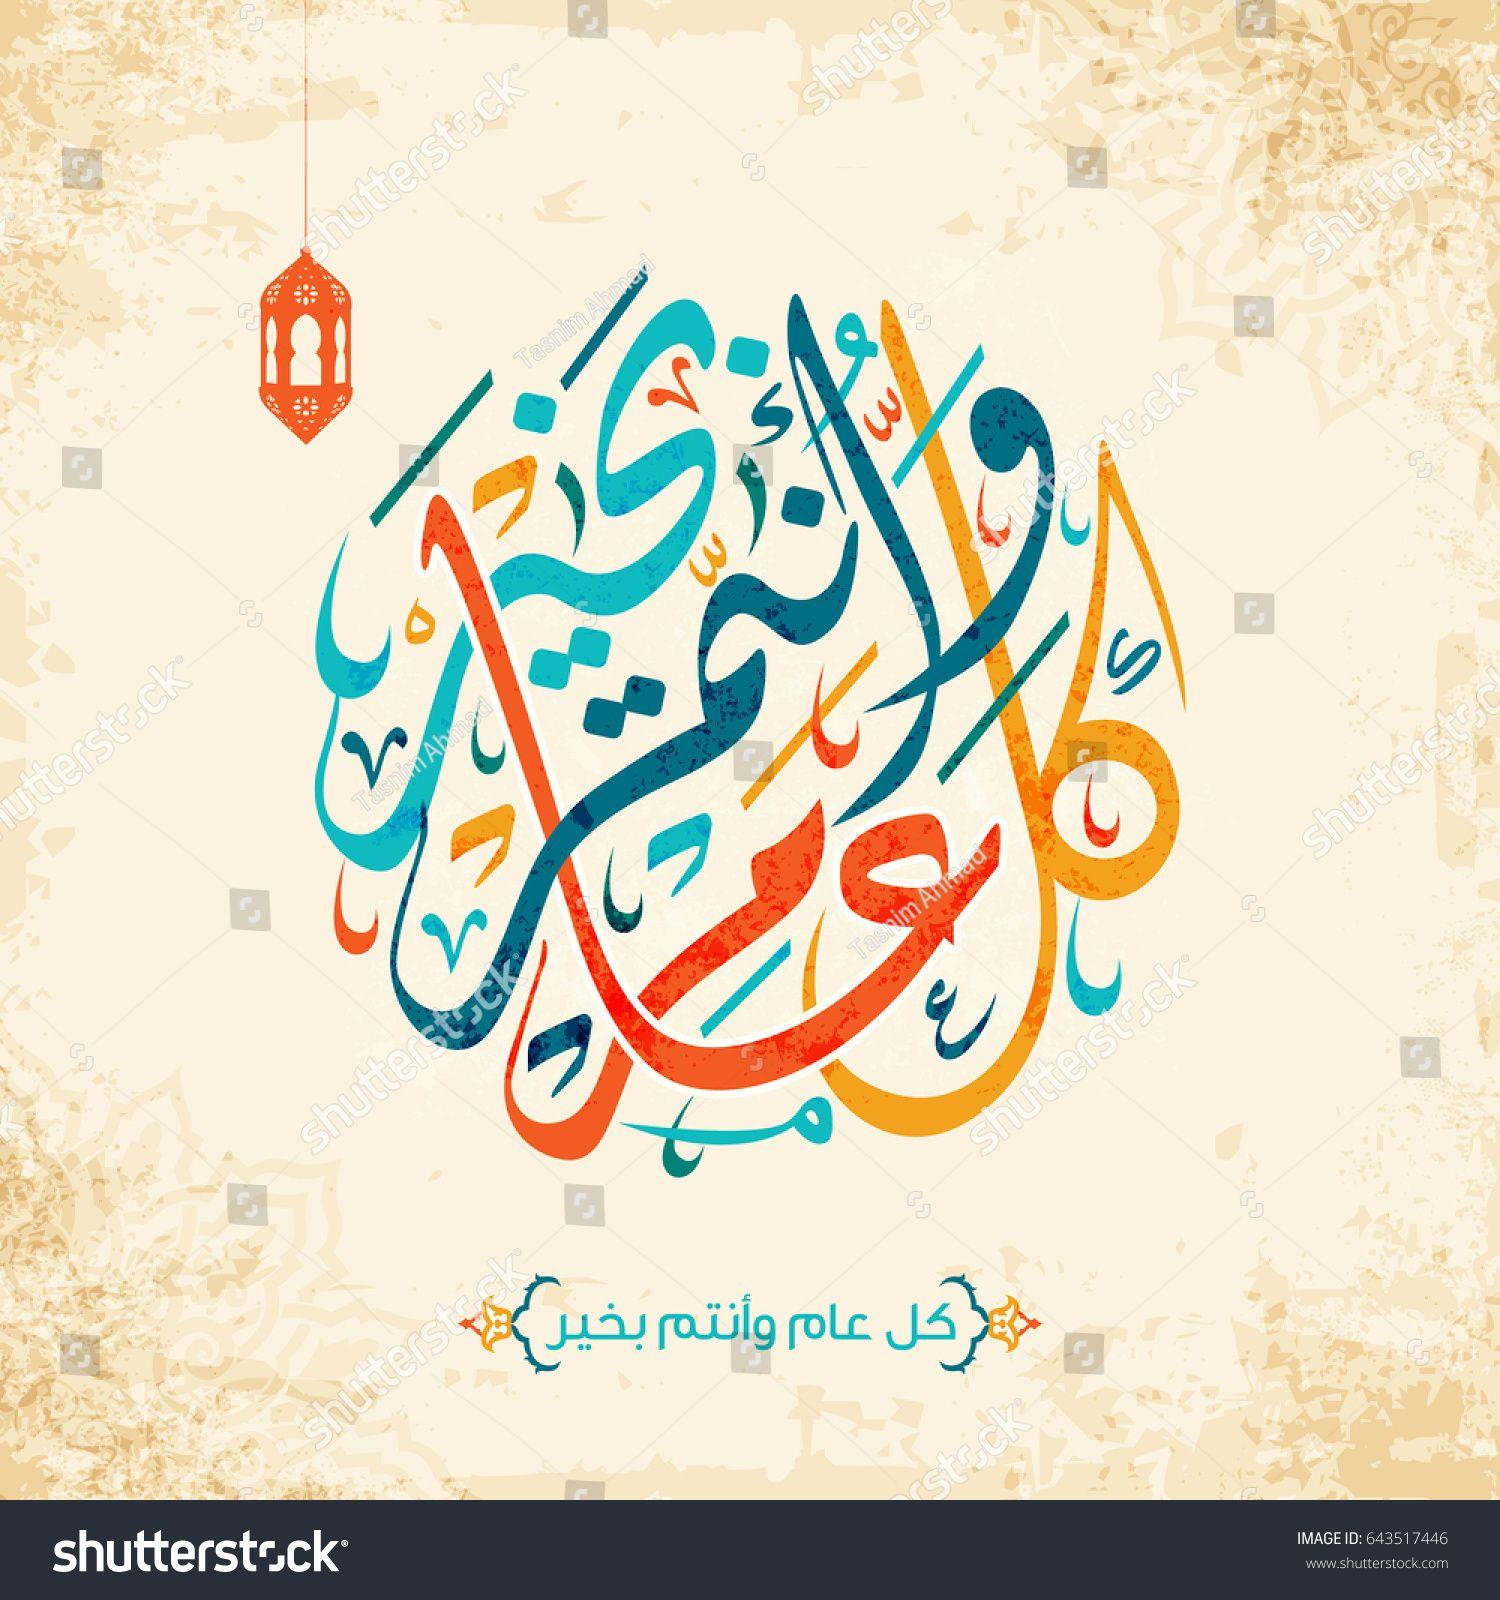 Happy Of Eid Eid Mubarak Greeting Card Vector Sponsored Affiliate Mubarak Eid Happy Vector In 2020 Eid Mubarak Greeting Cards Eid Mubarak Greetings Happy Eid